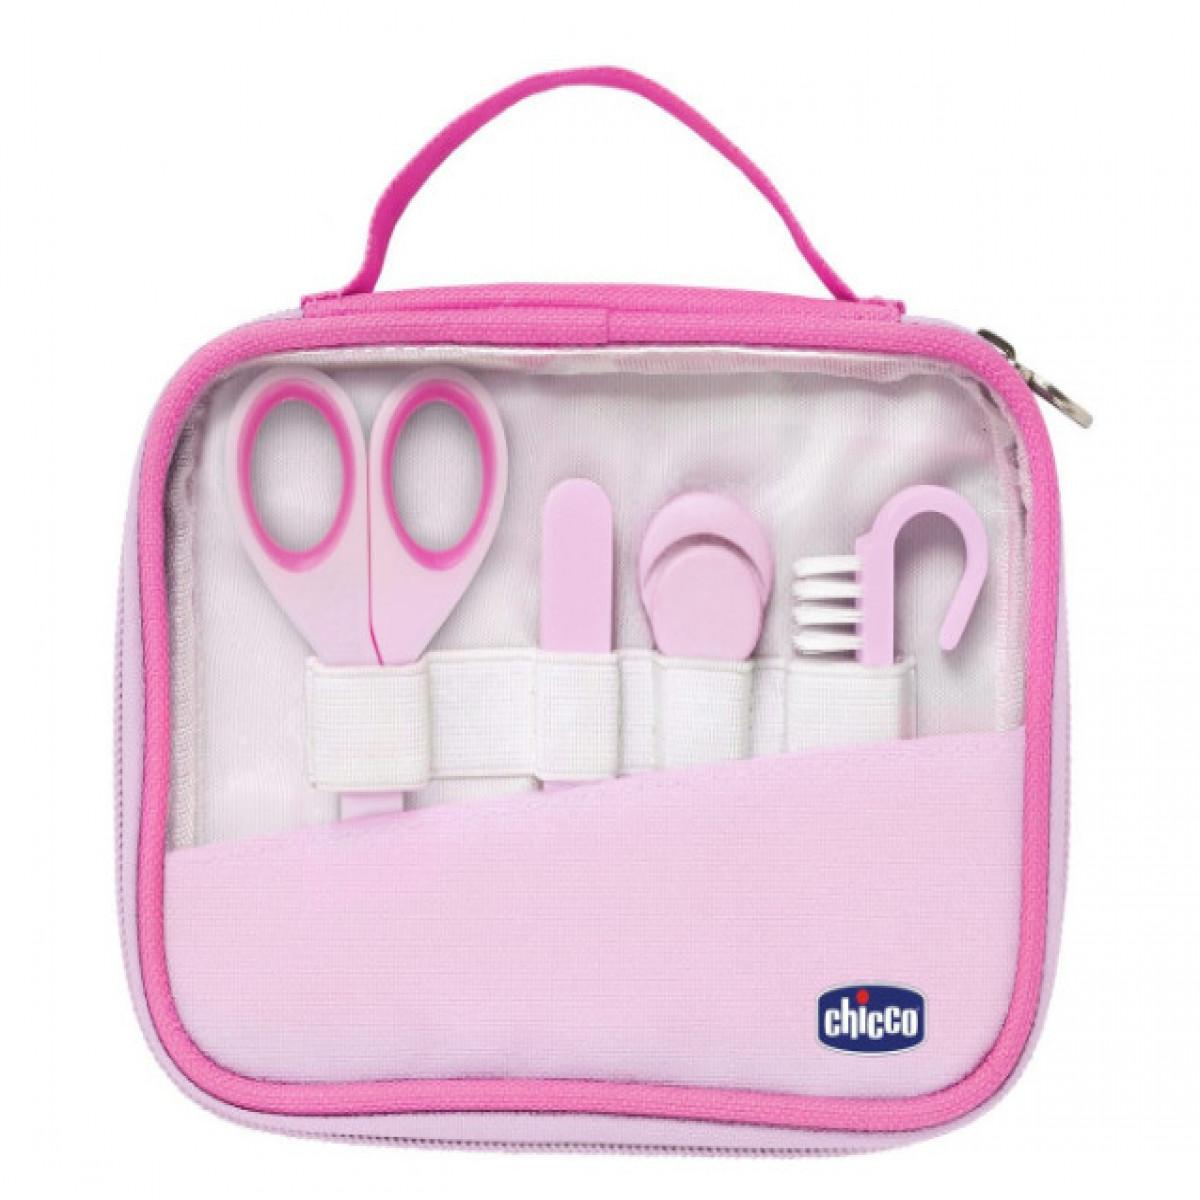 Set de higiene  Chicco rosa